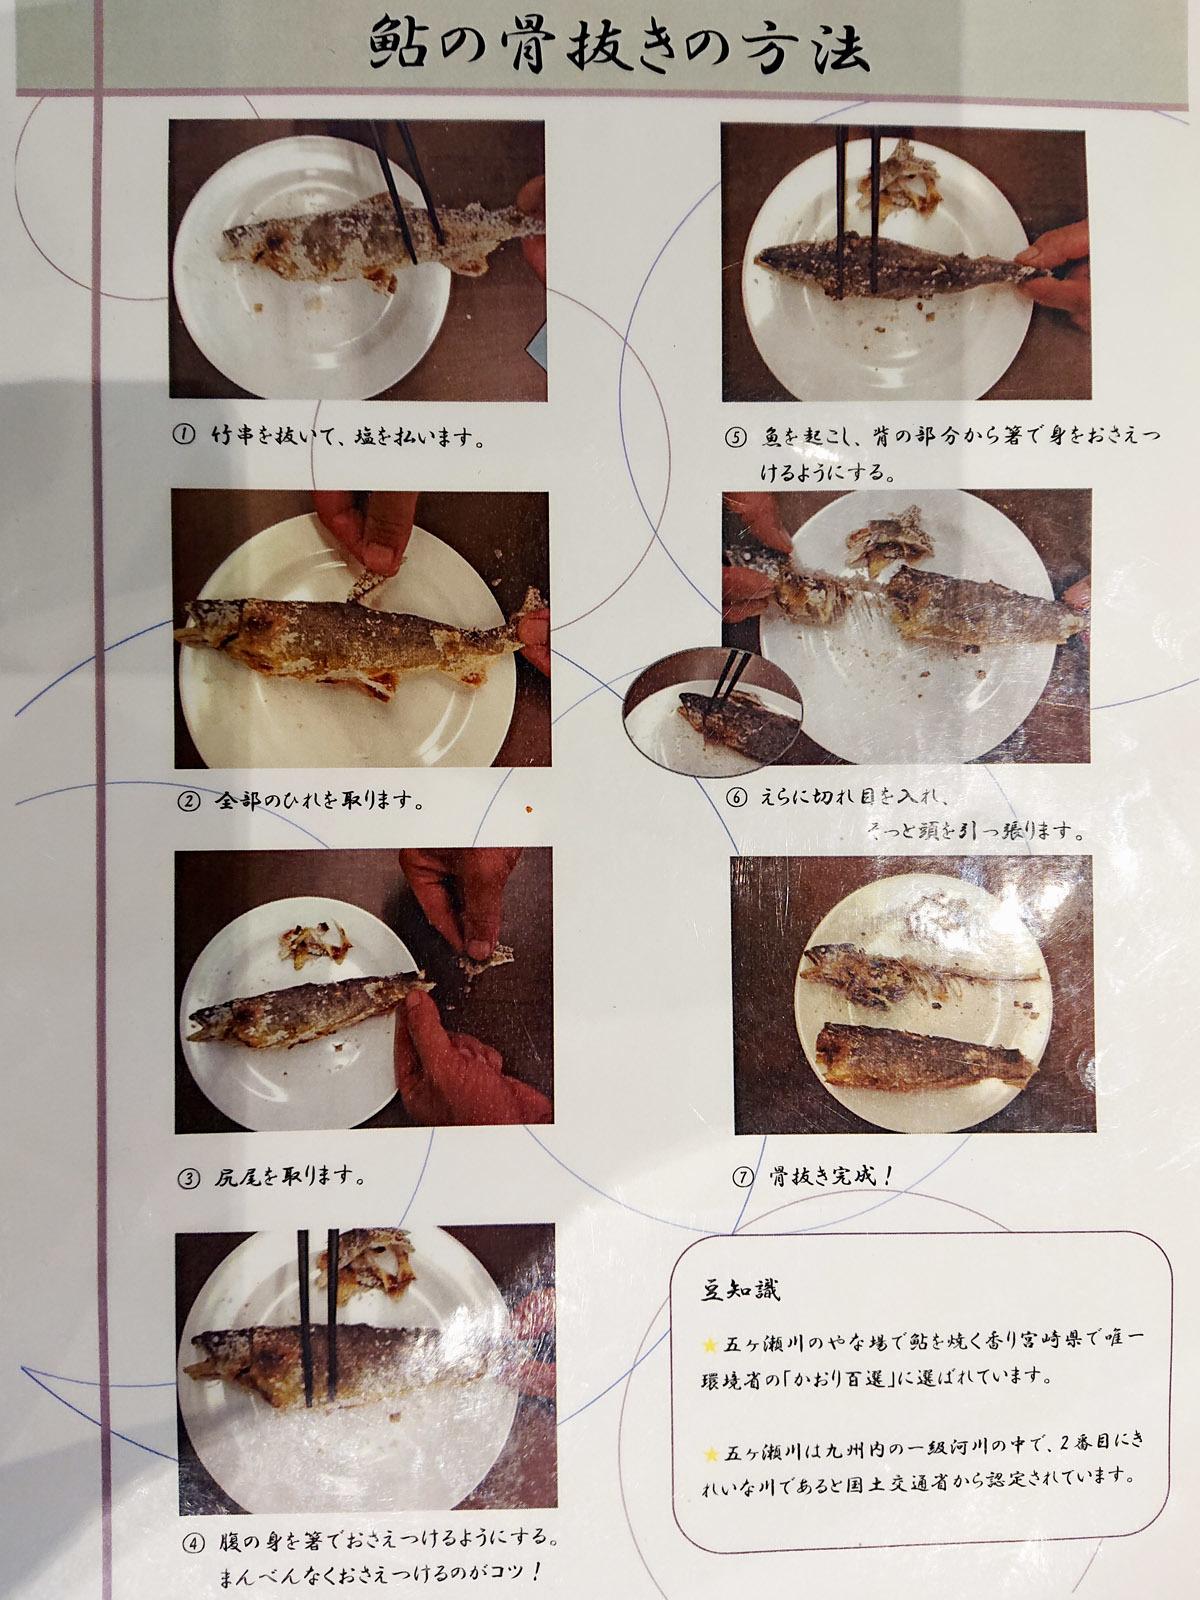 kokugikan_setumei.jpg